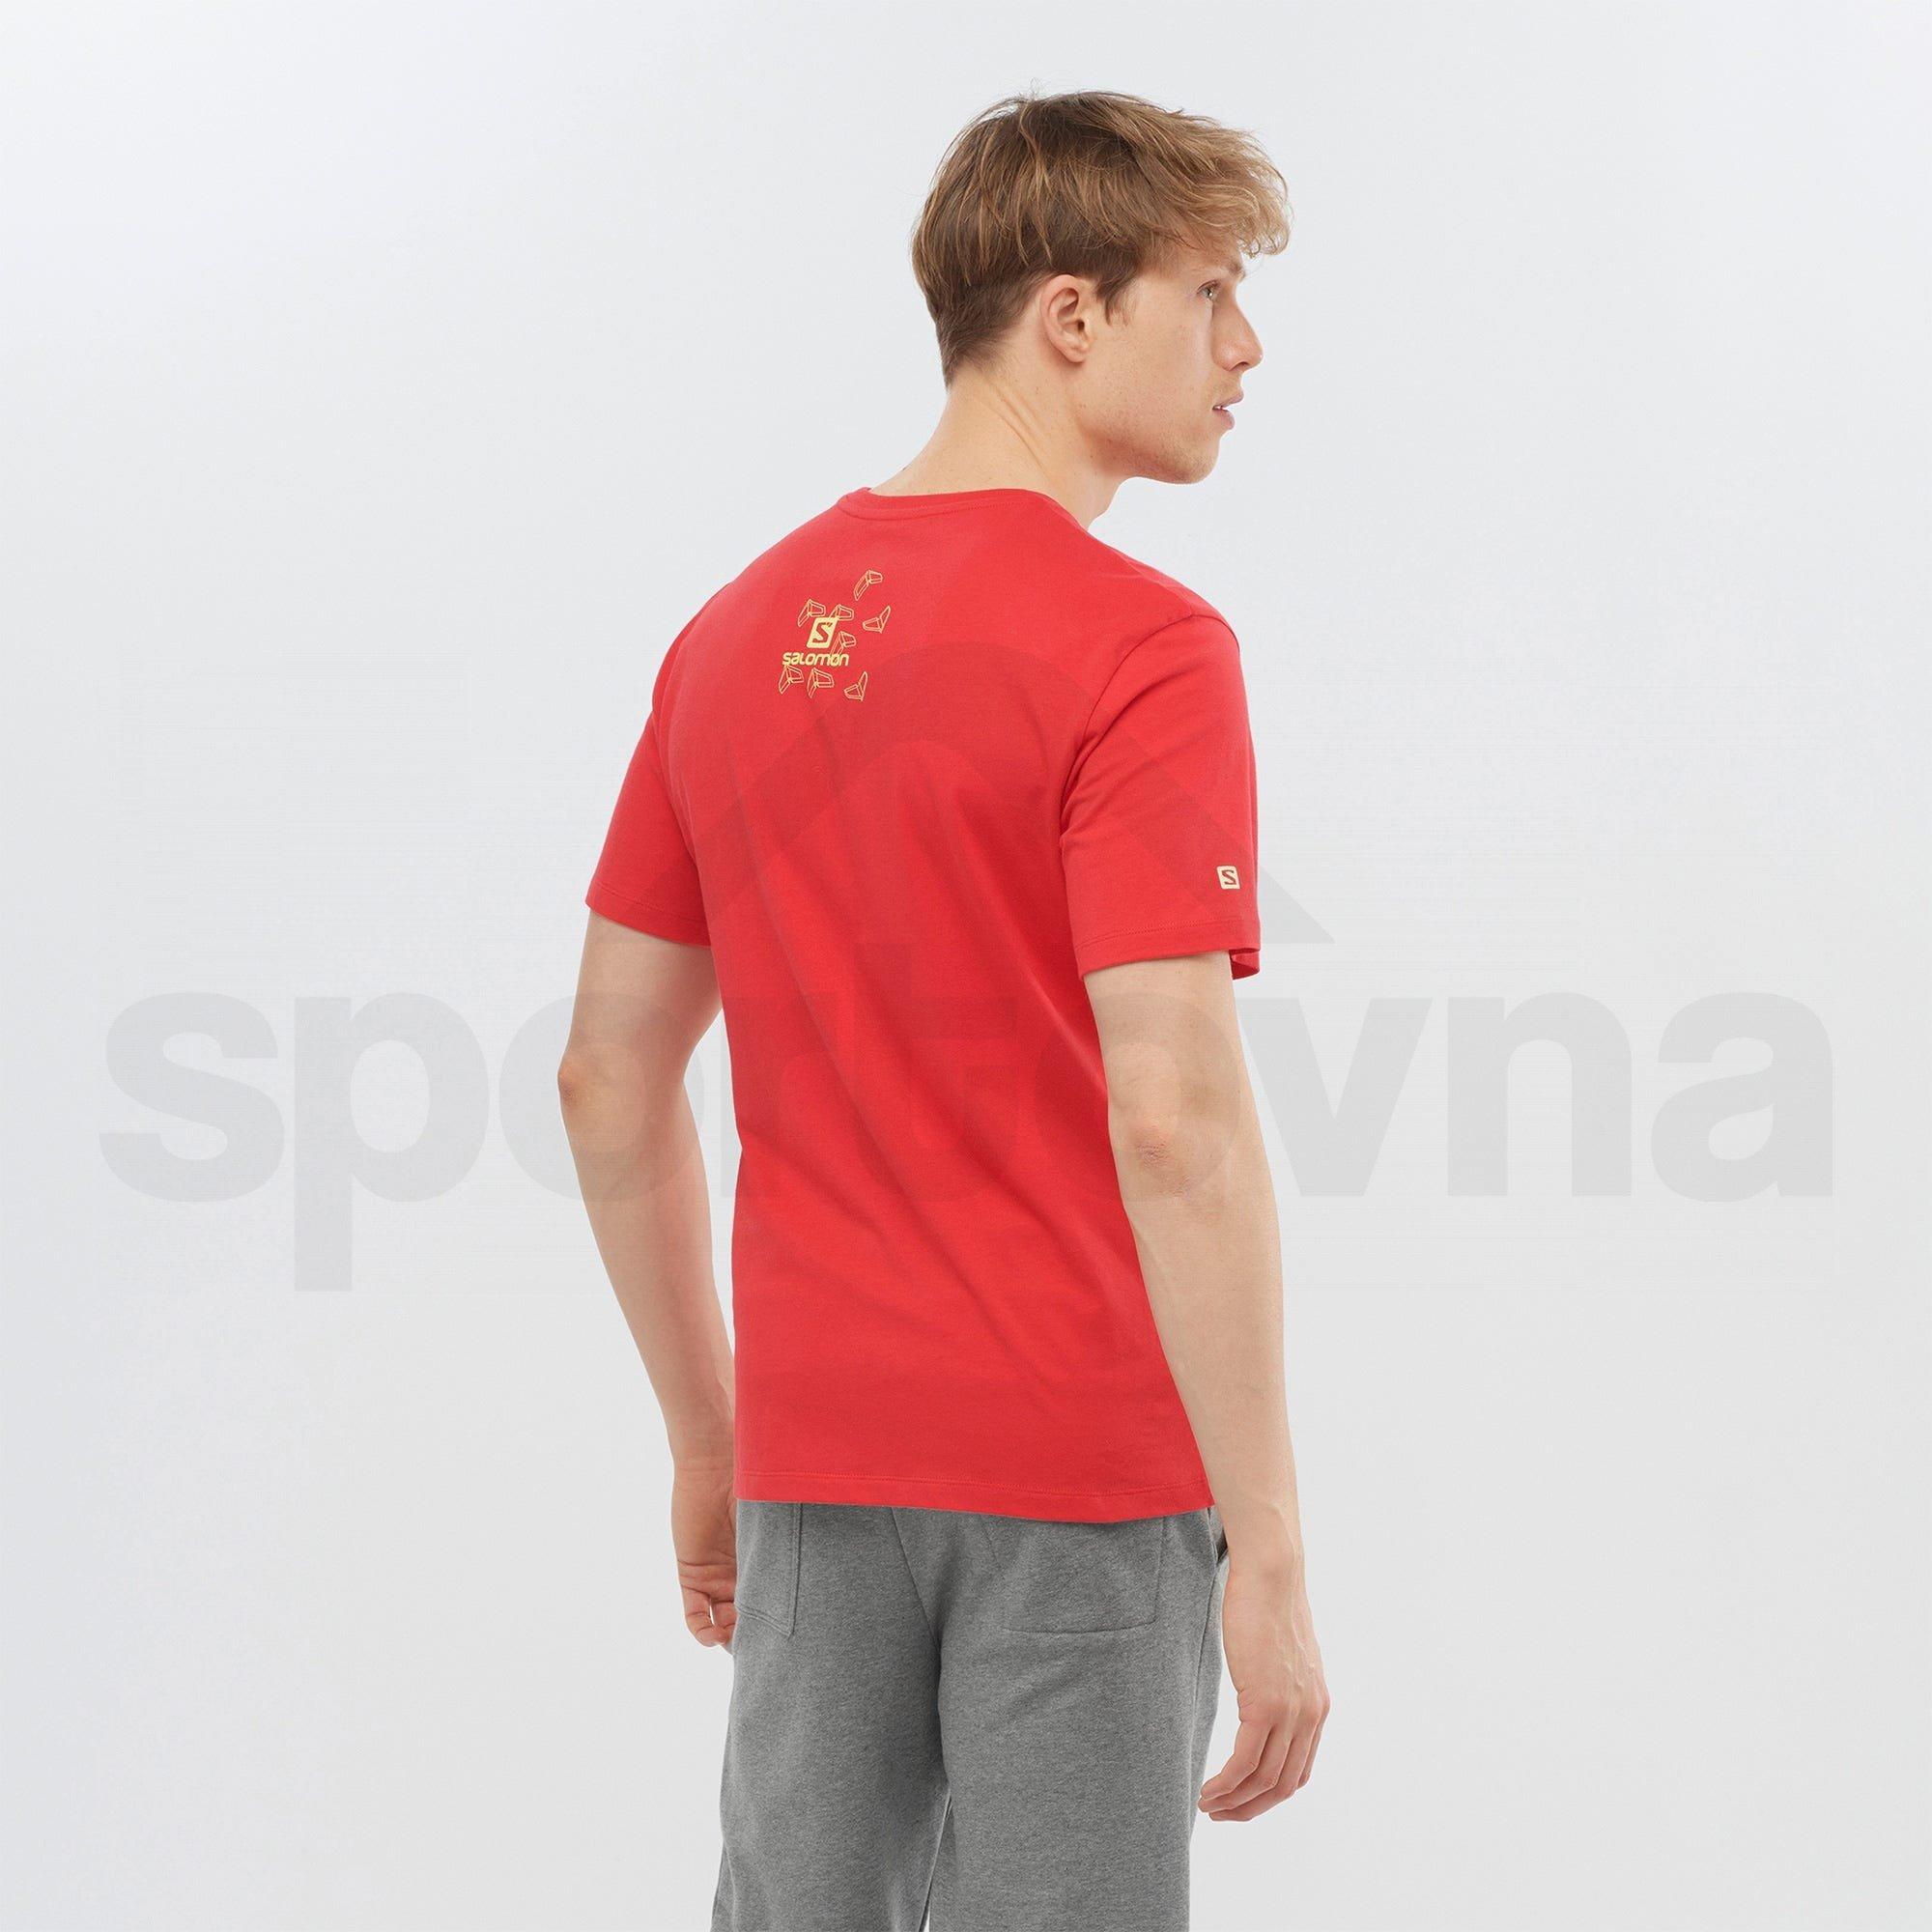 Tričko Salomon OUTLIFE GRAPHIC BLUEPRINT M - červená